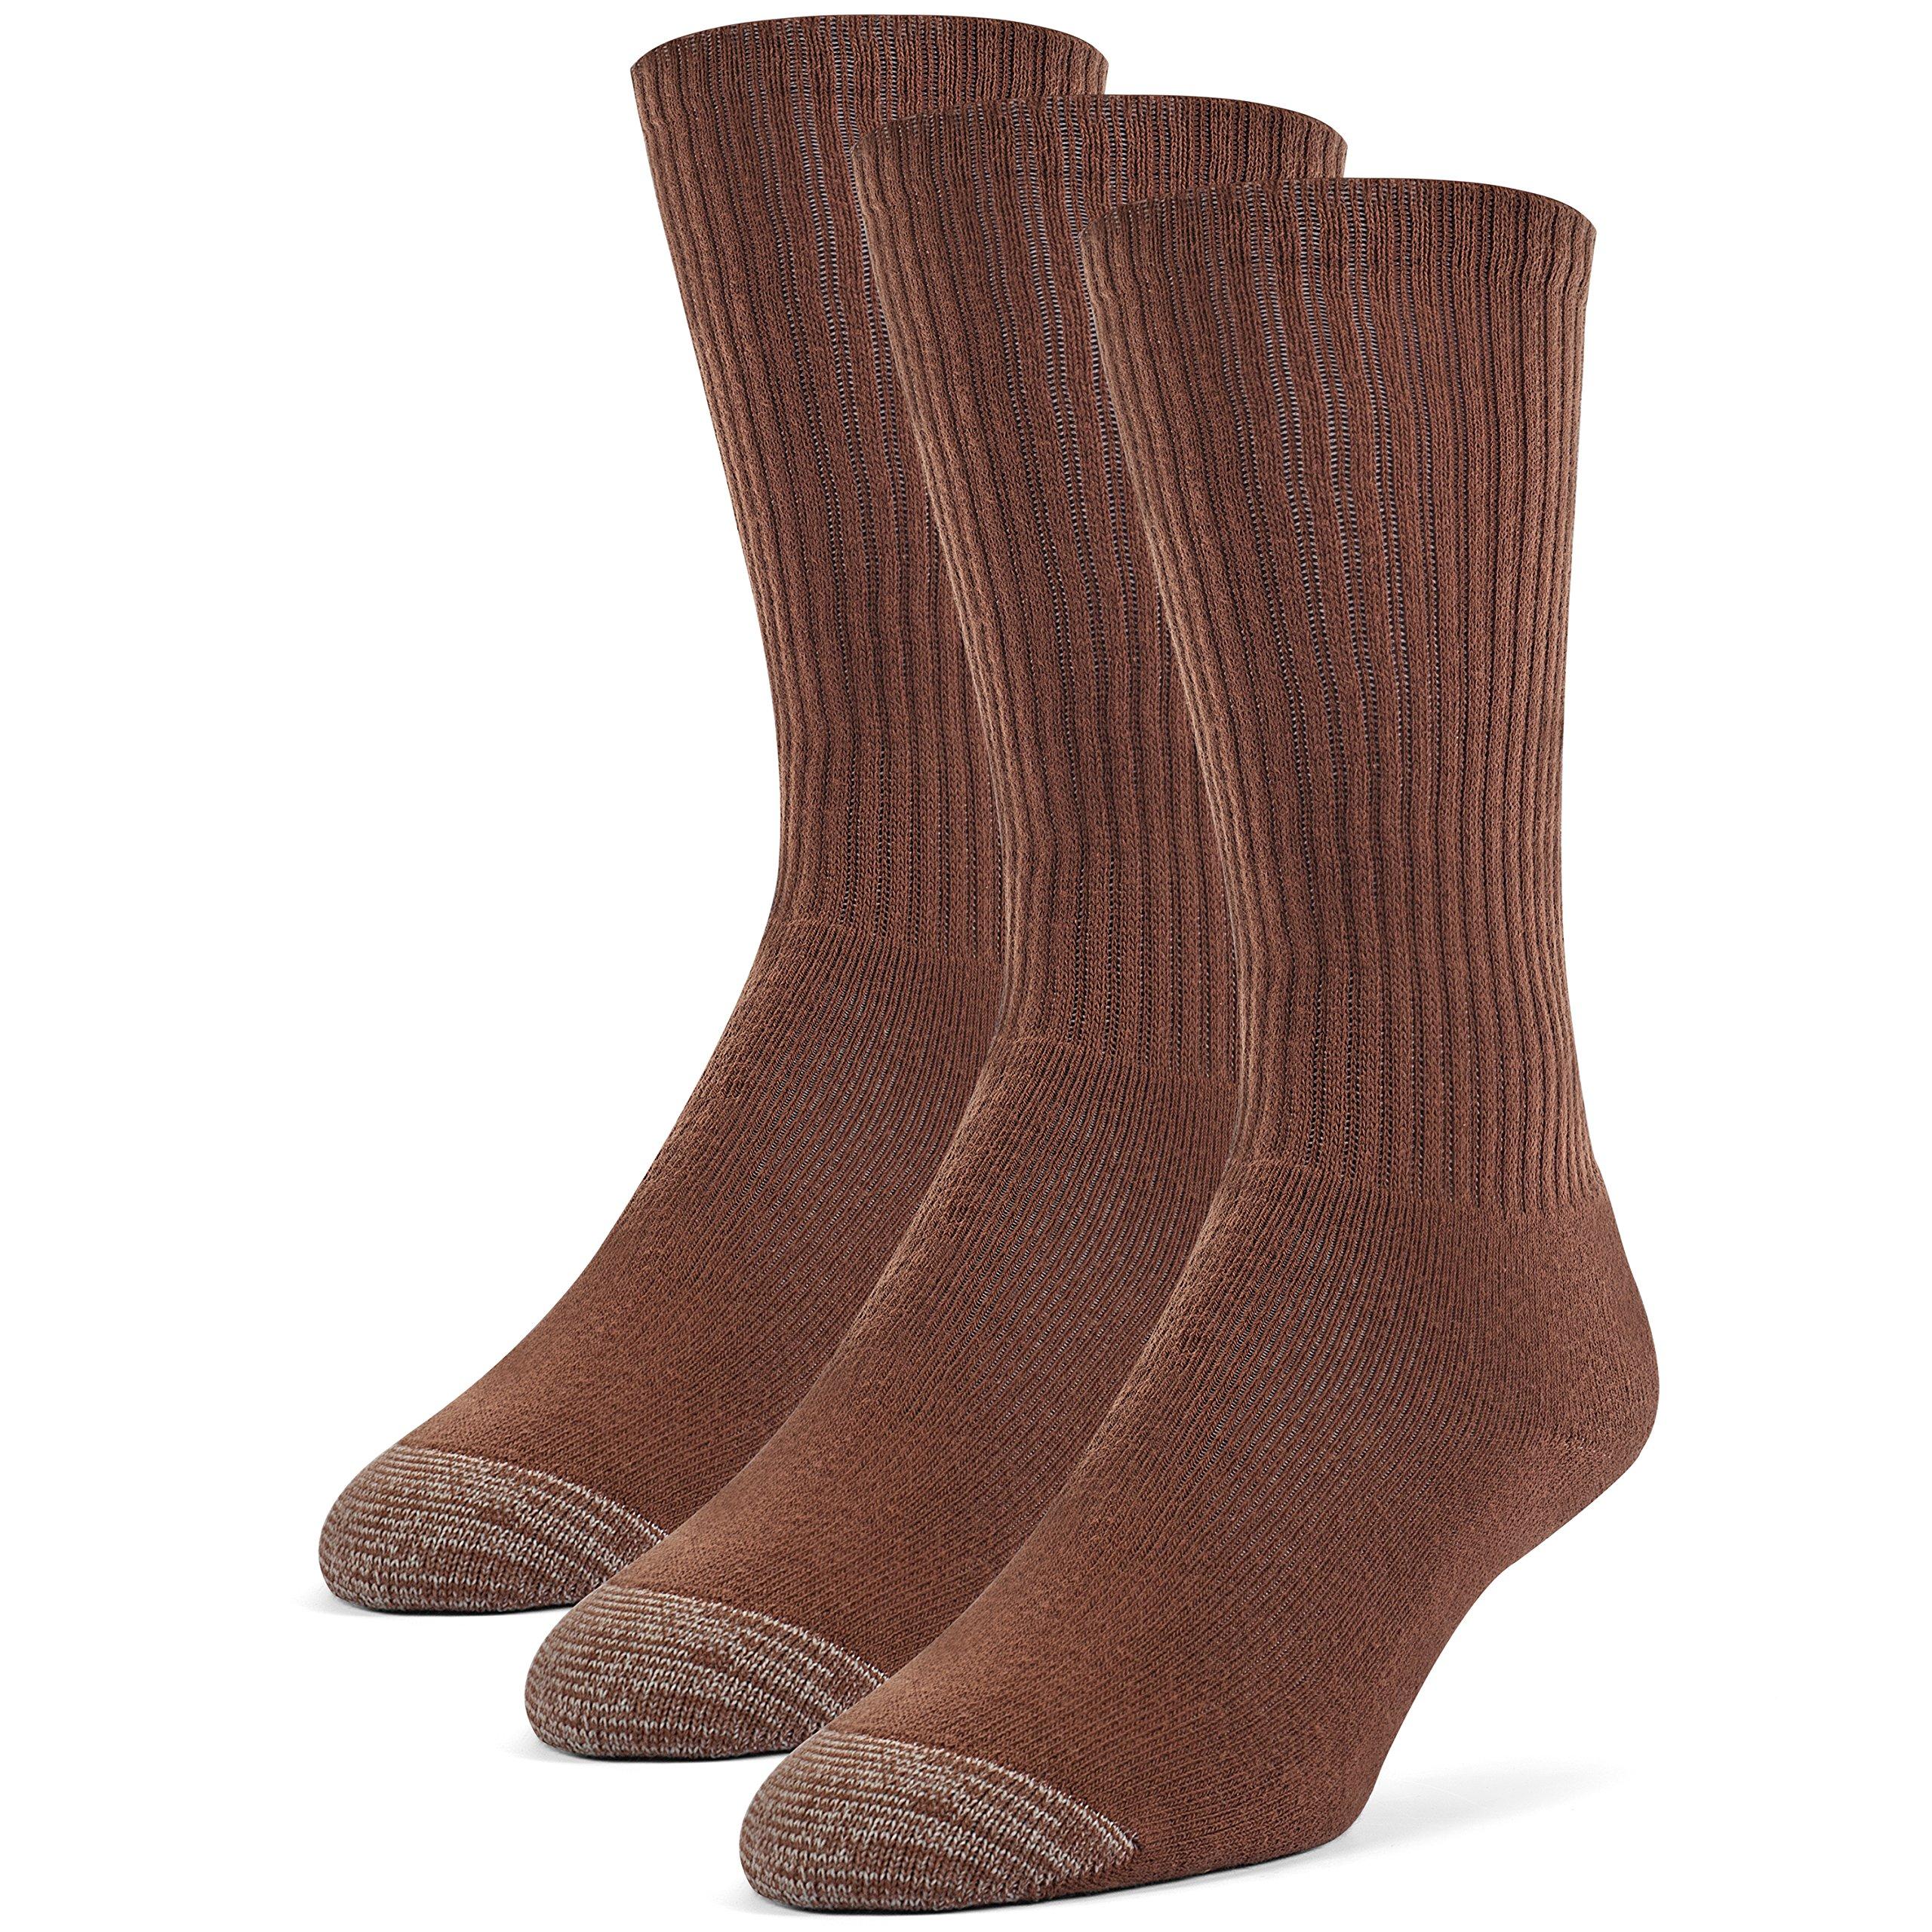 Galiva Men's Cotton Extra Soft Crew Cushion Socks - 3 Pairs, Medium, Brown